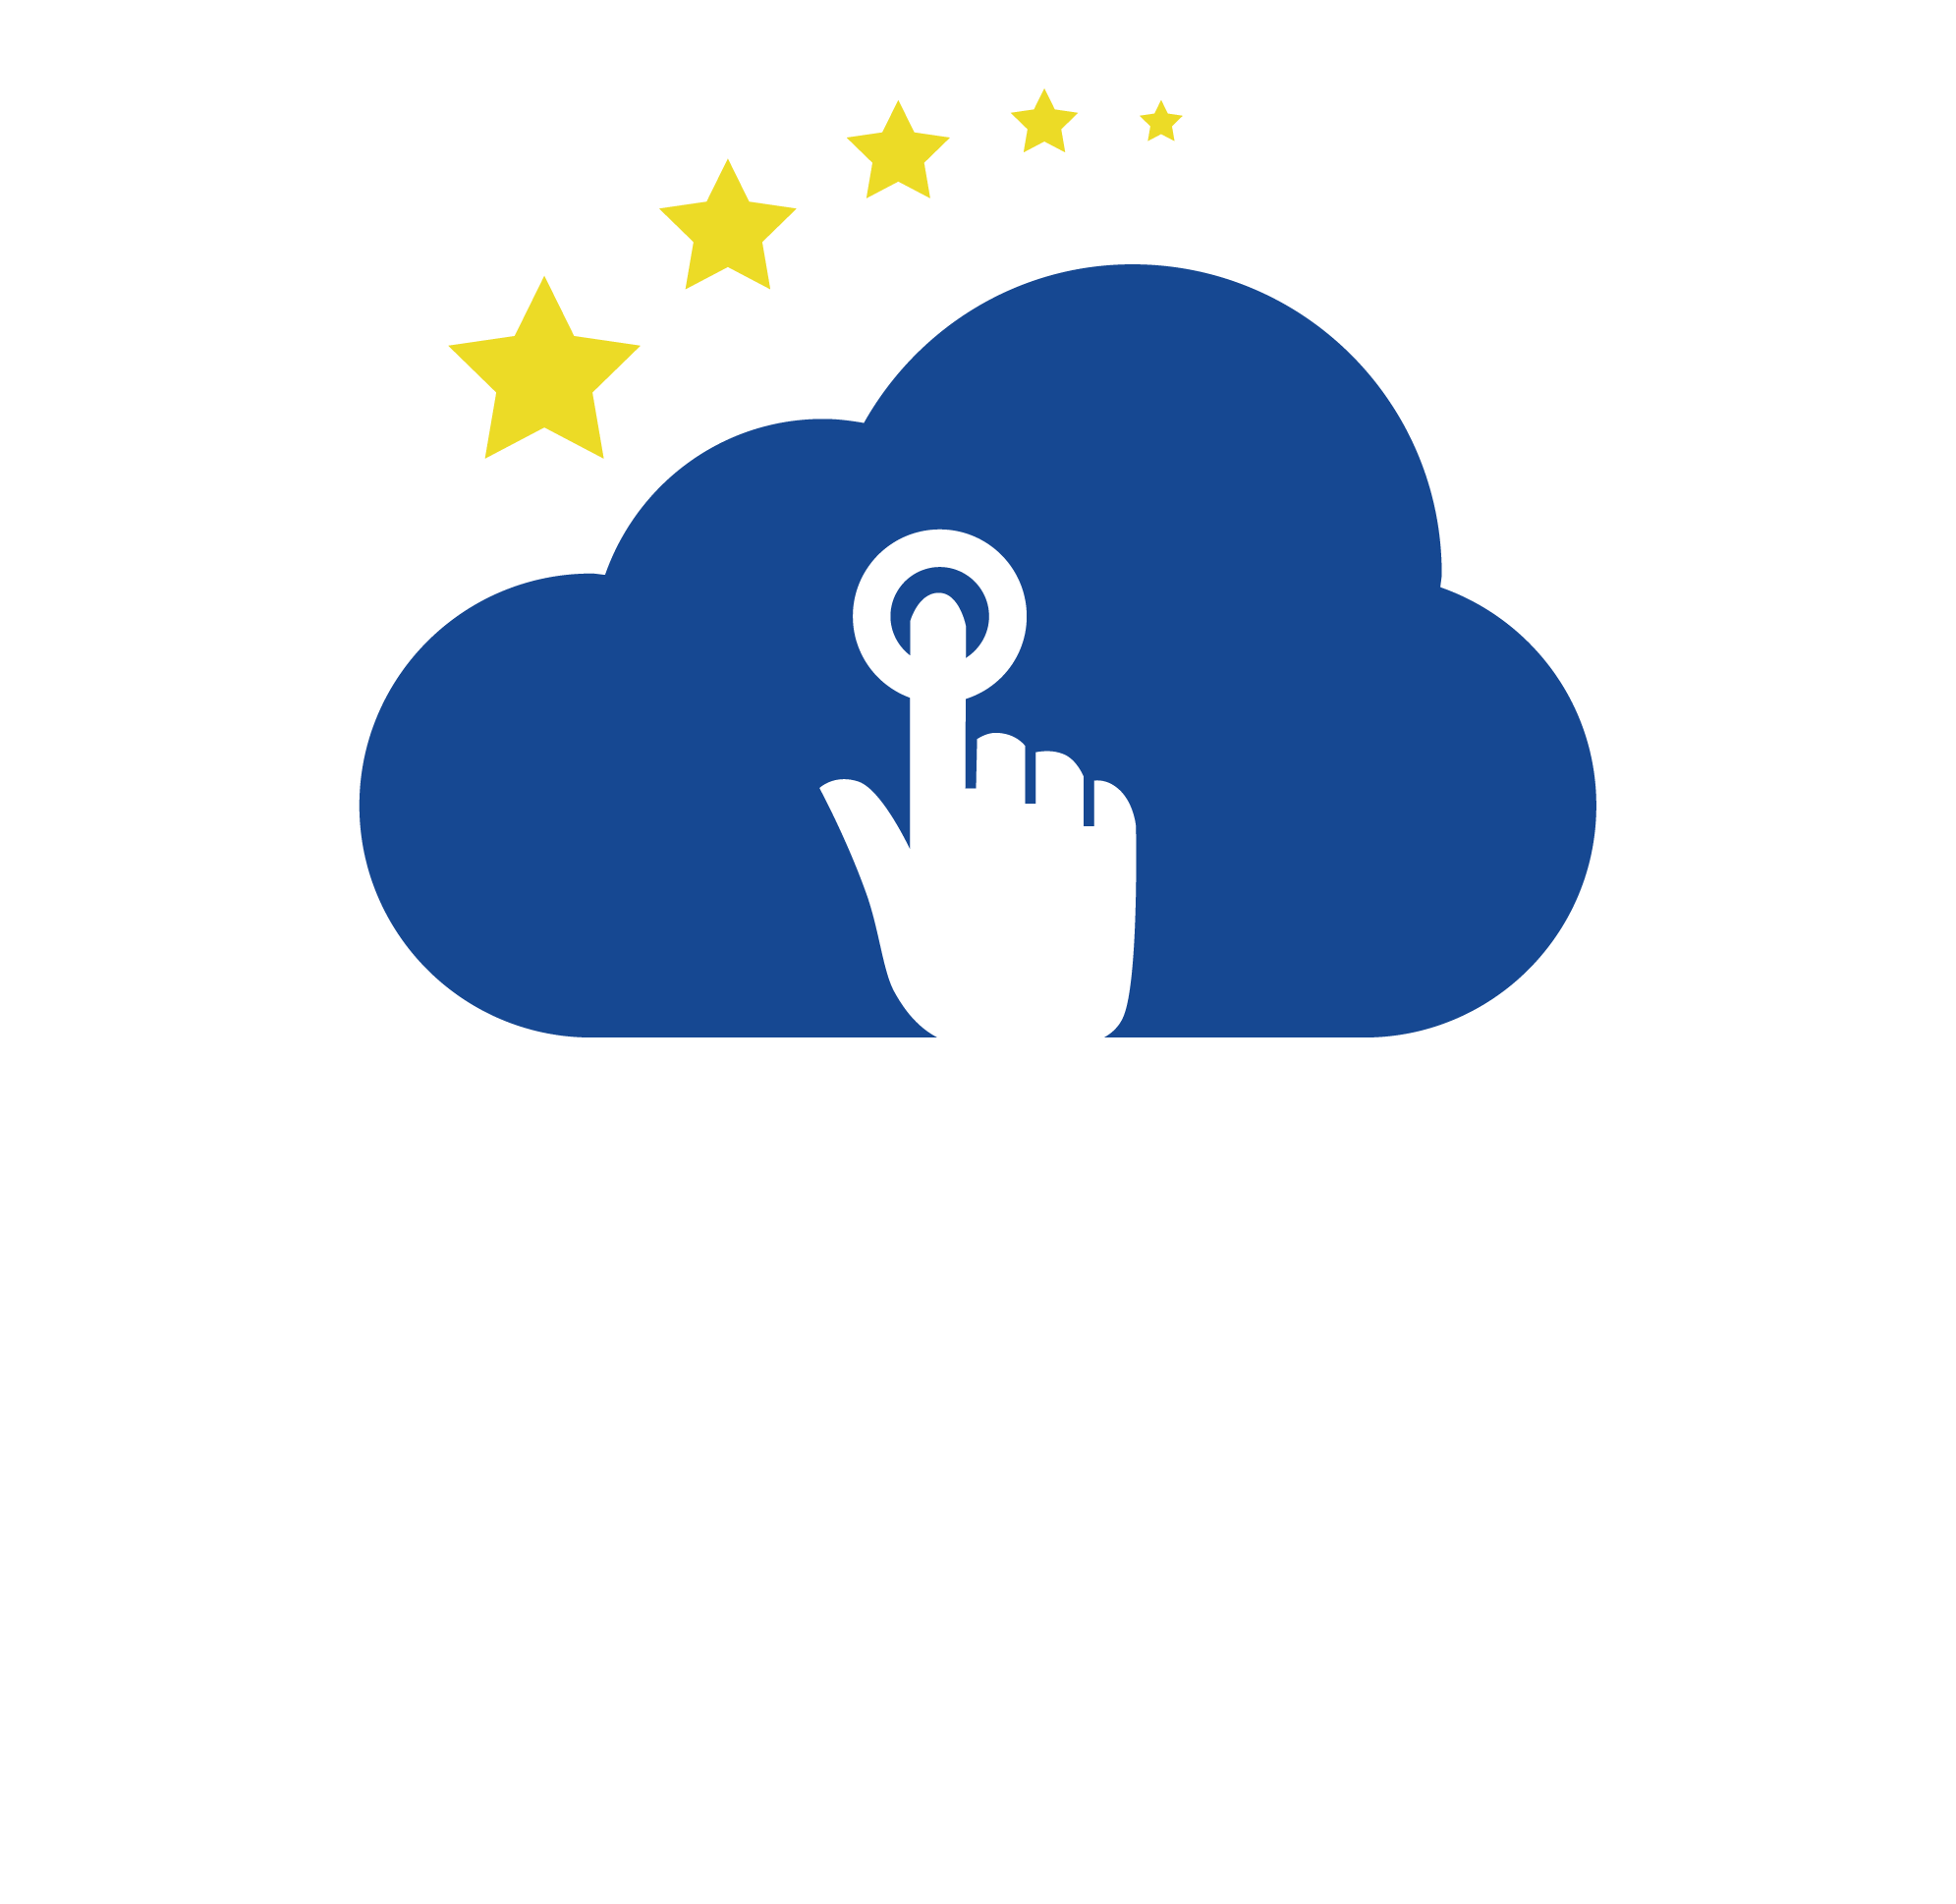 tellop-logo-transparent-01.png